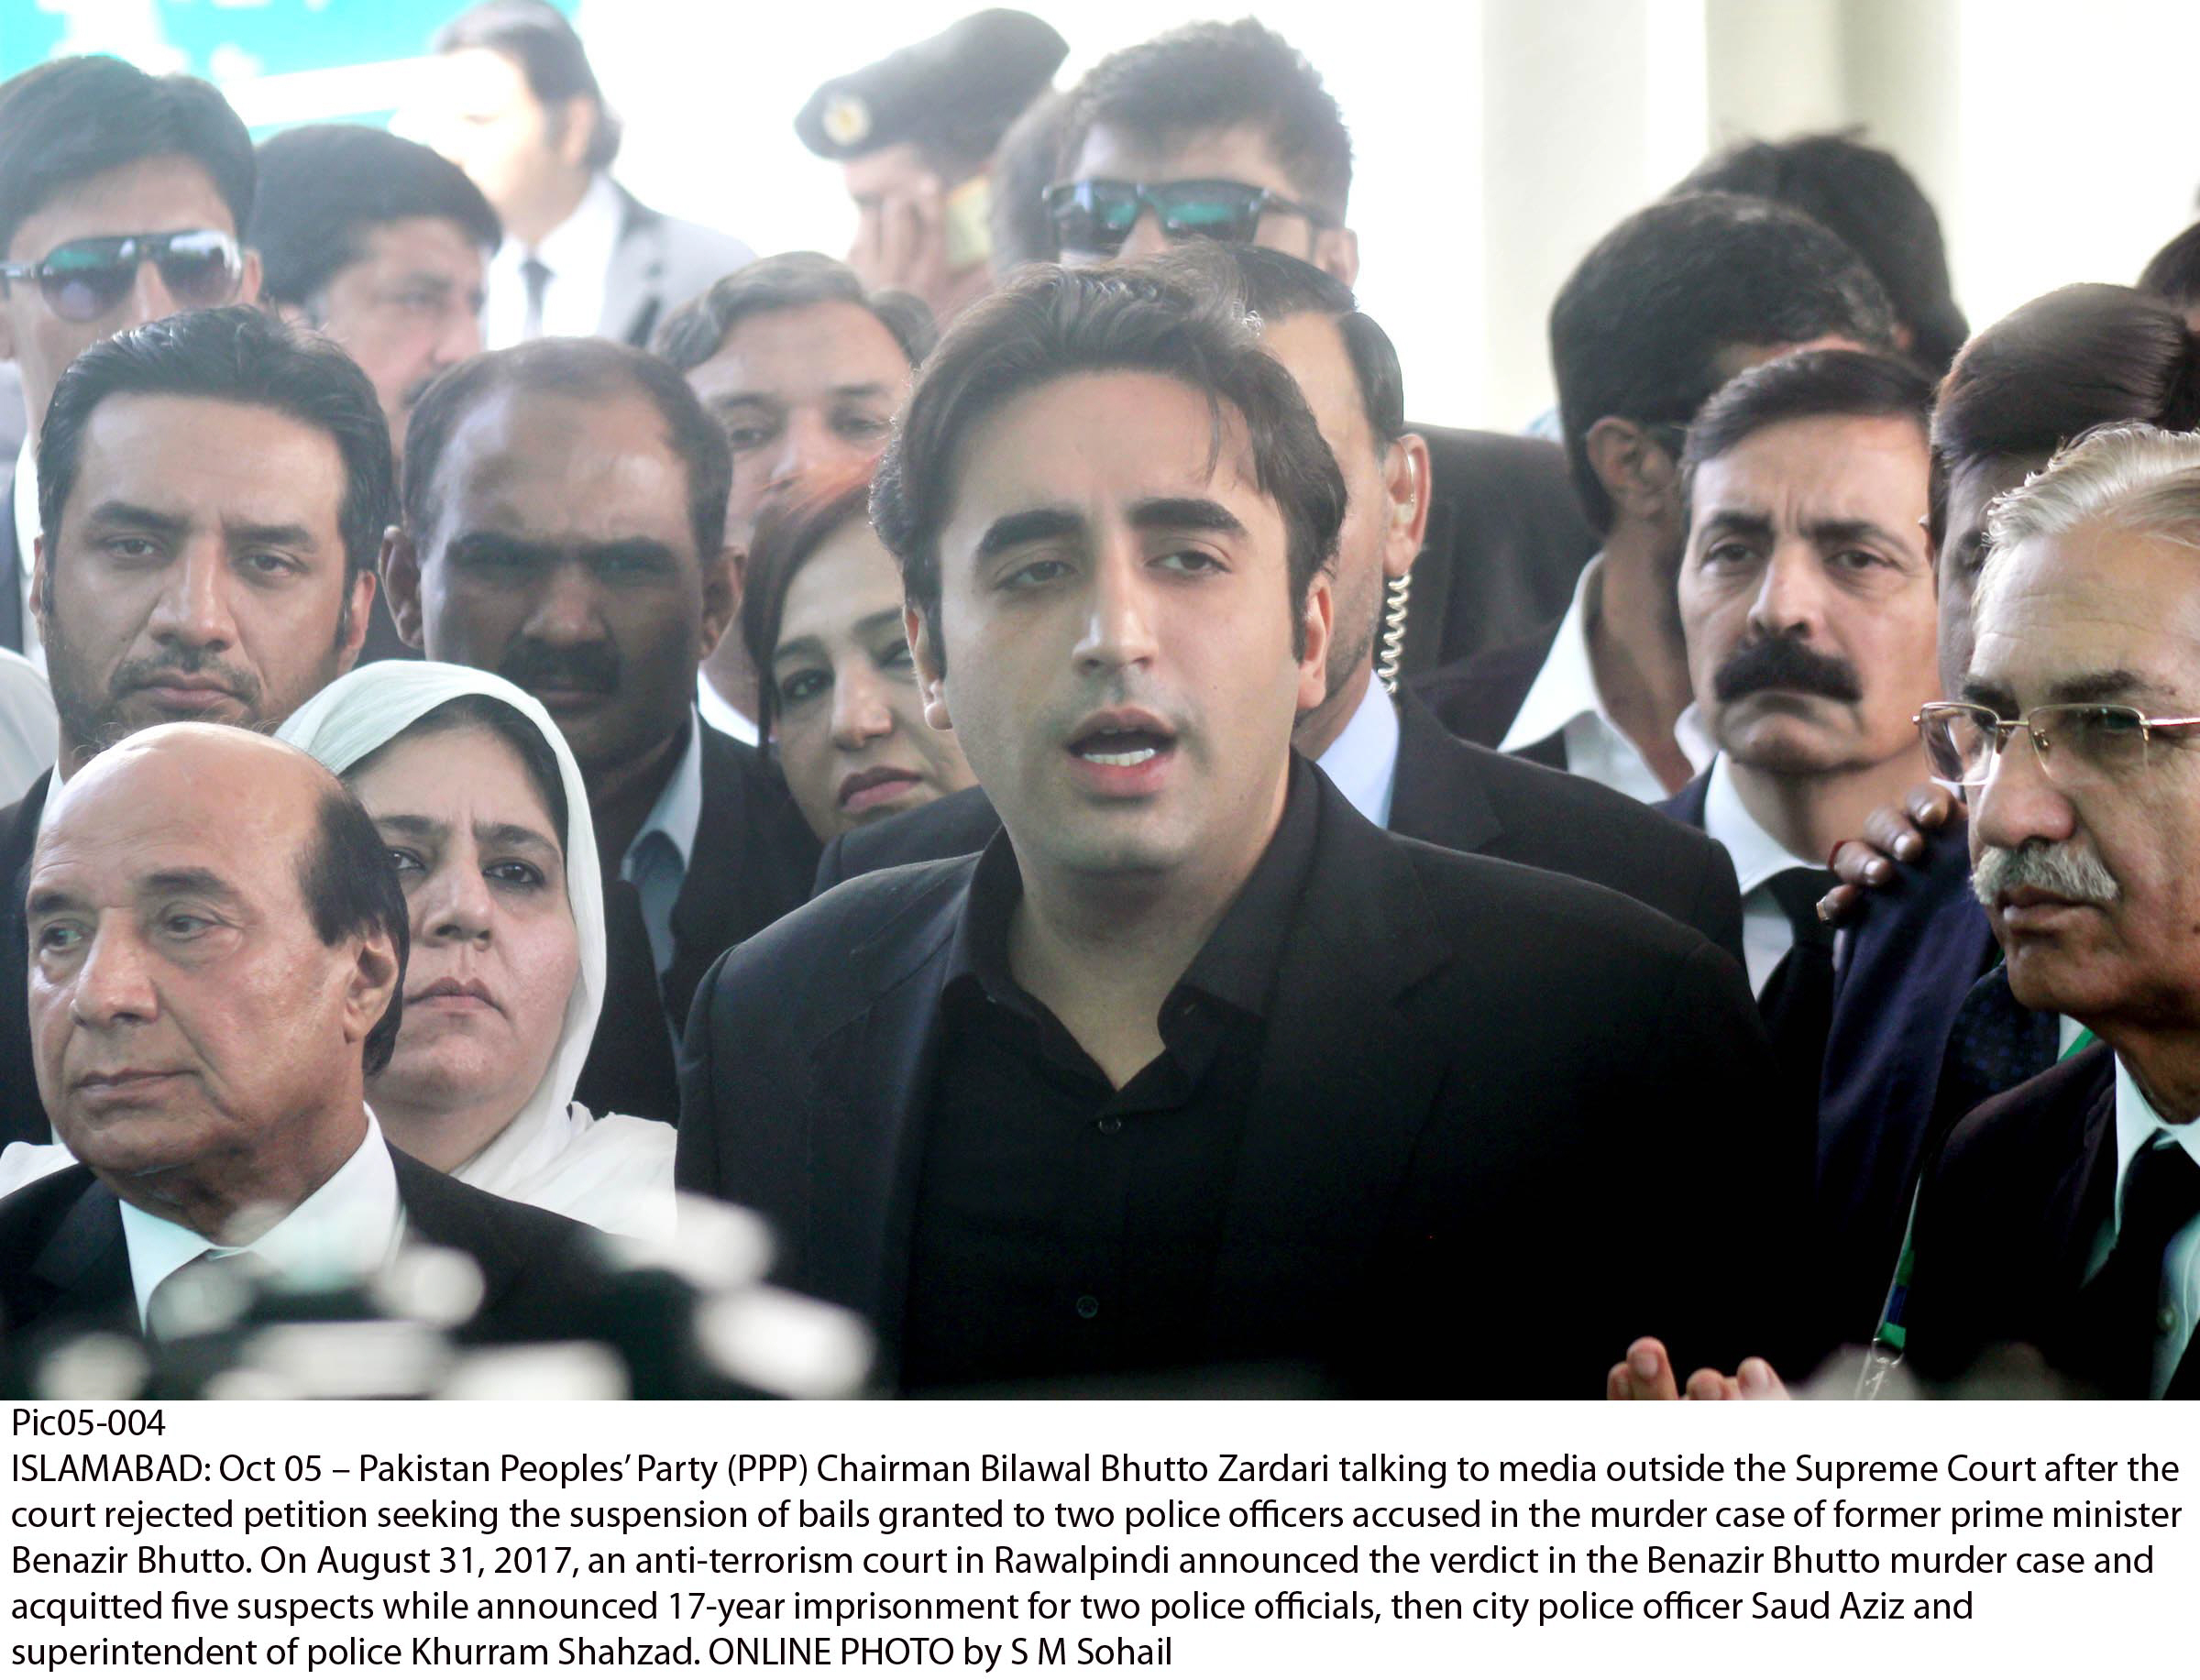 our time has just begun bilawal demands release of political prisoners